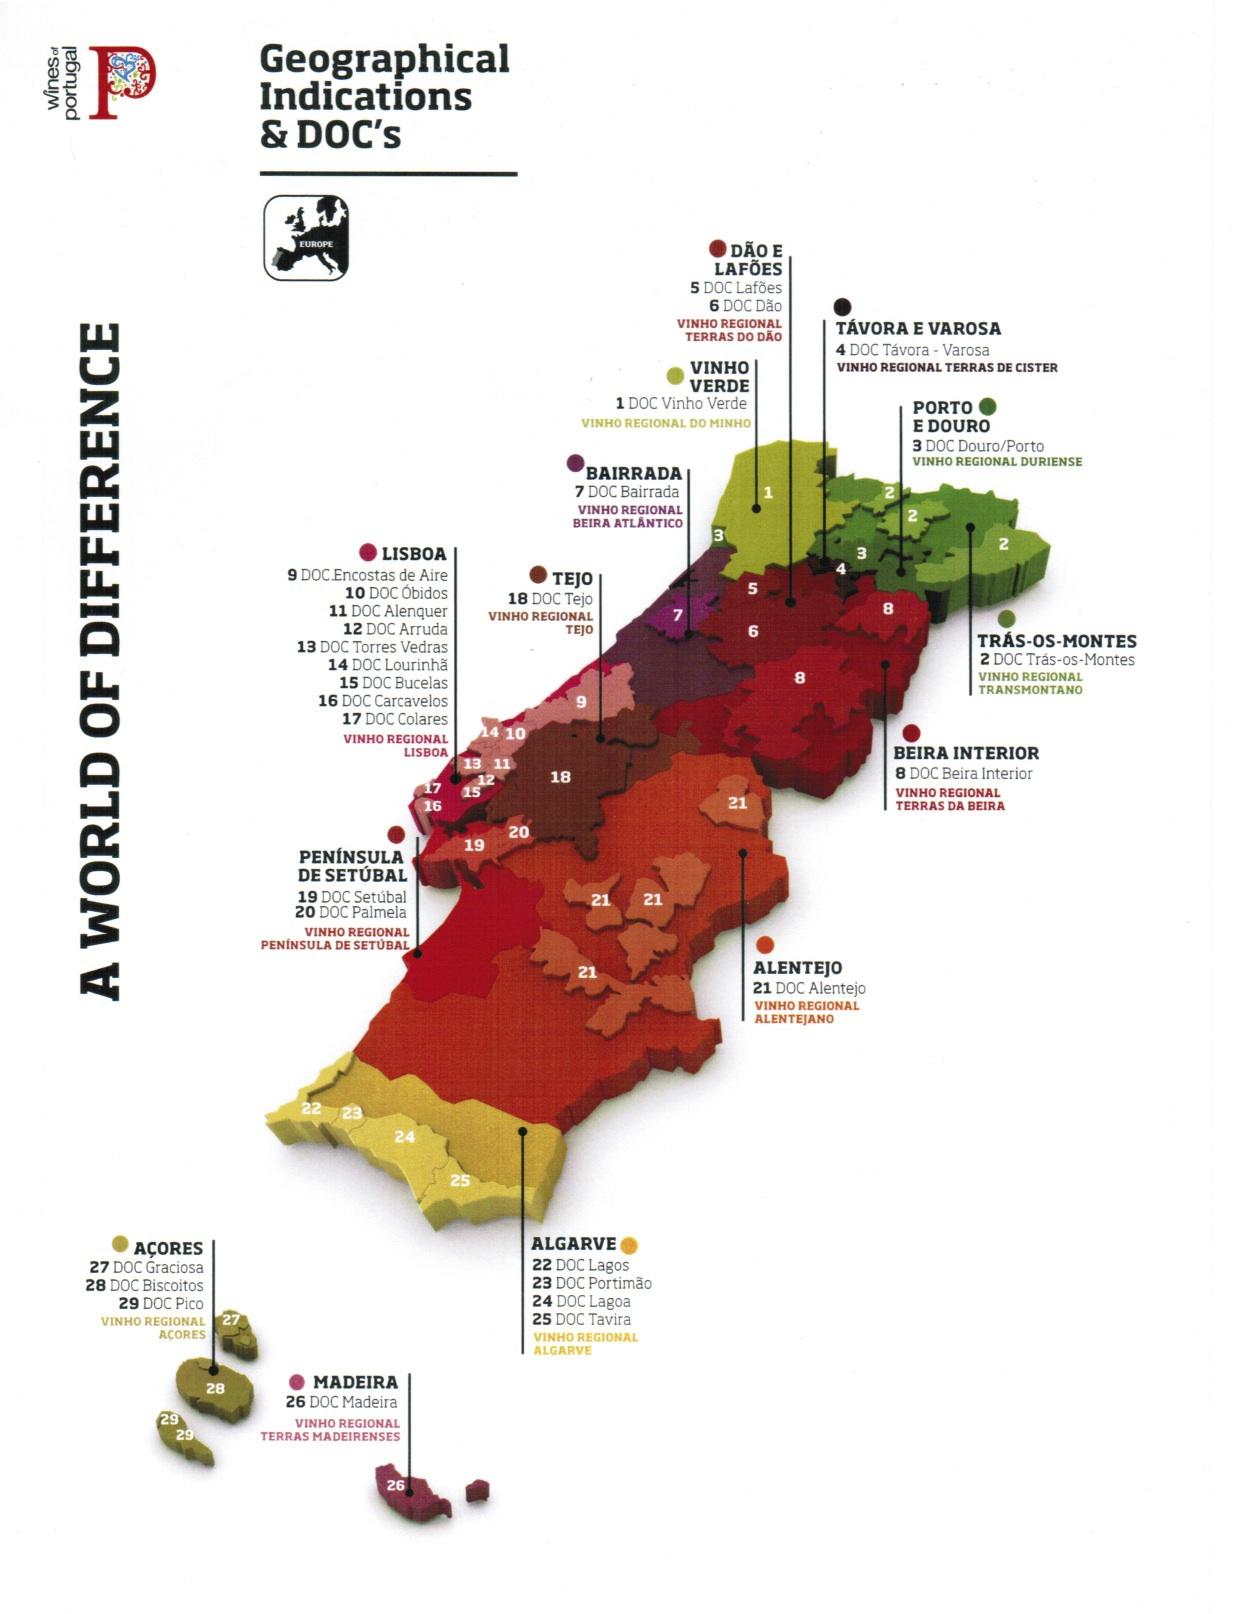 Wine regions of Portugal...